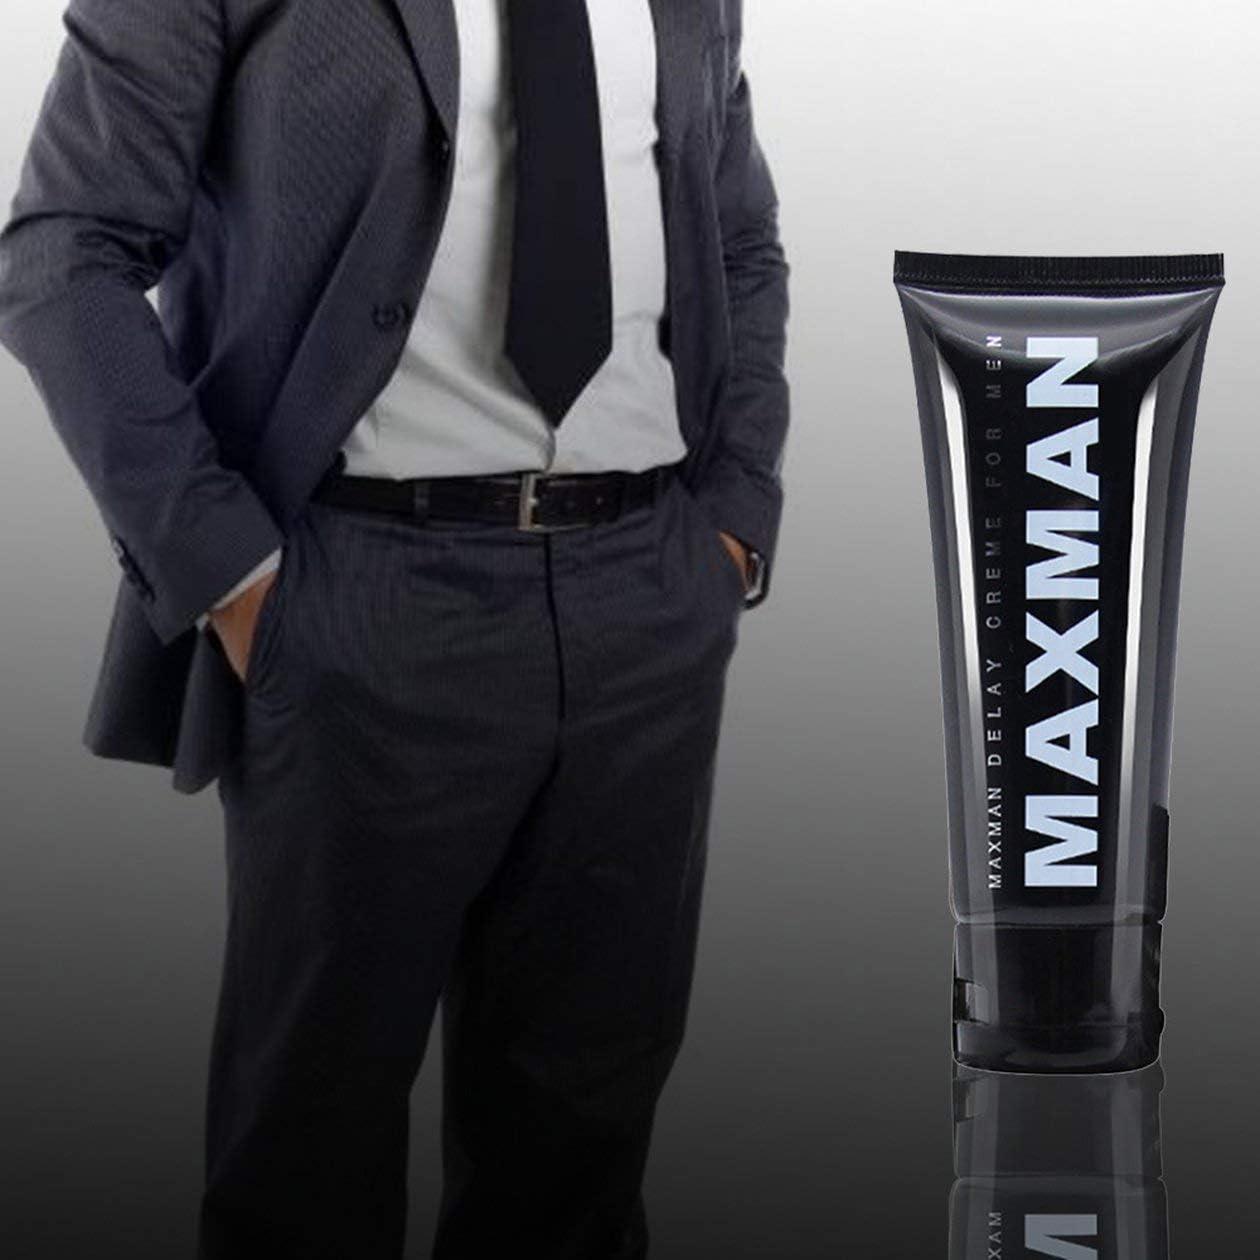 HONZIRY Productos para agrandar el pene Masculino Aumentar ...